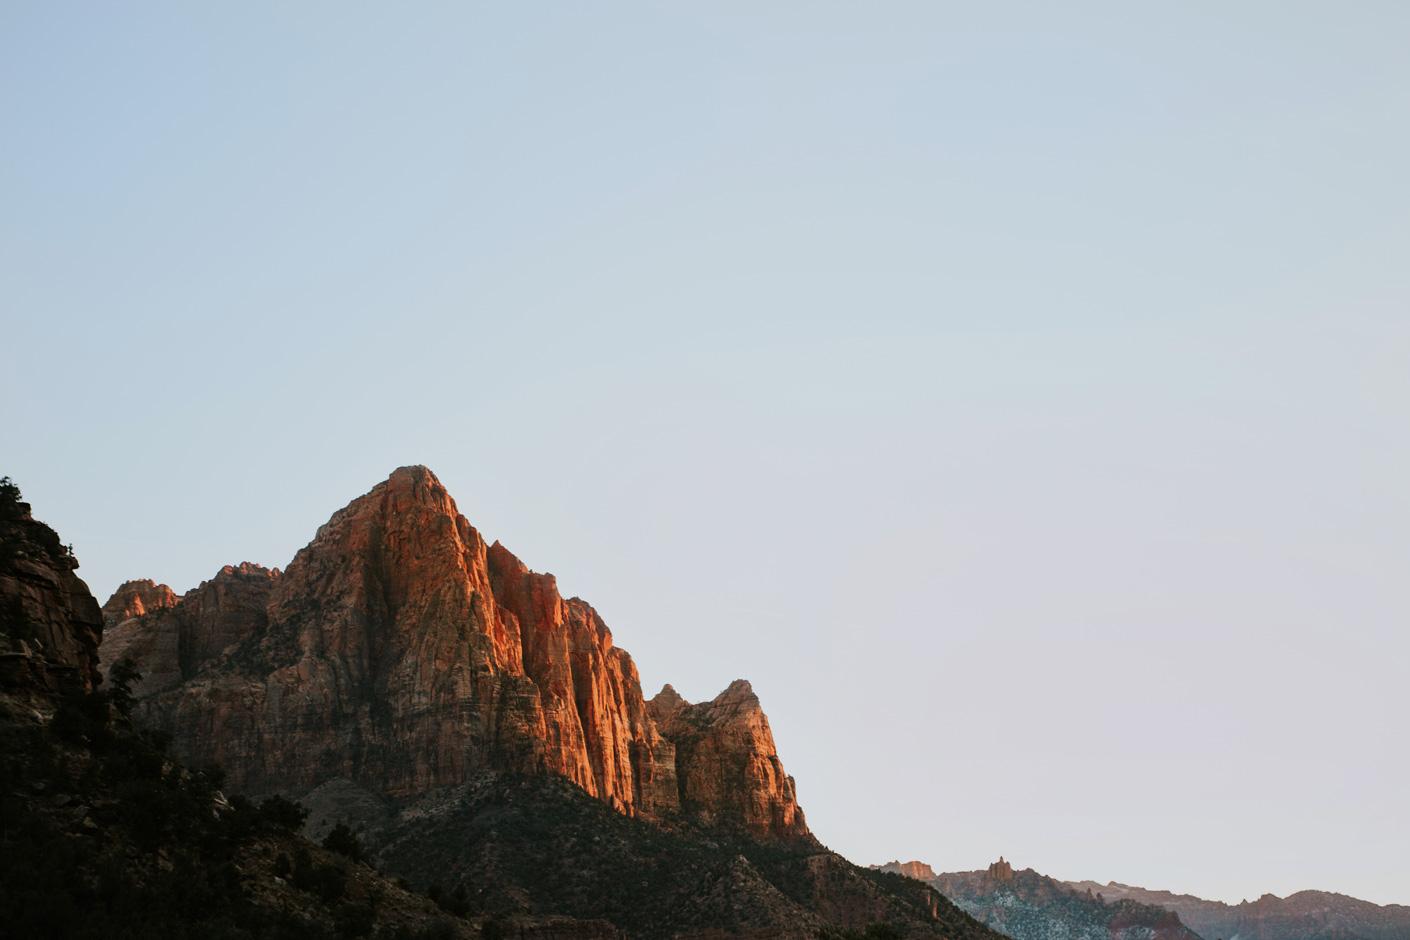 CindyGiovagnoli_Utah_Zion_desert_night_morning_coffee_blm_land_off_grid-001.jpg